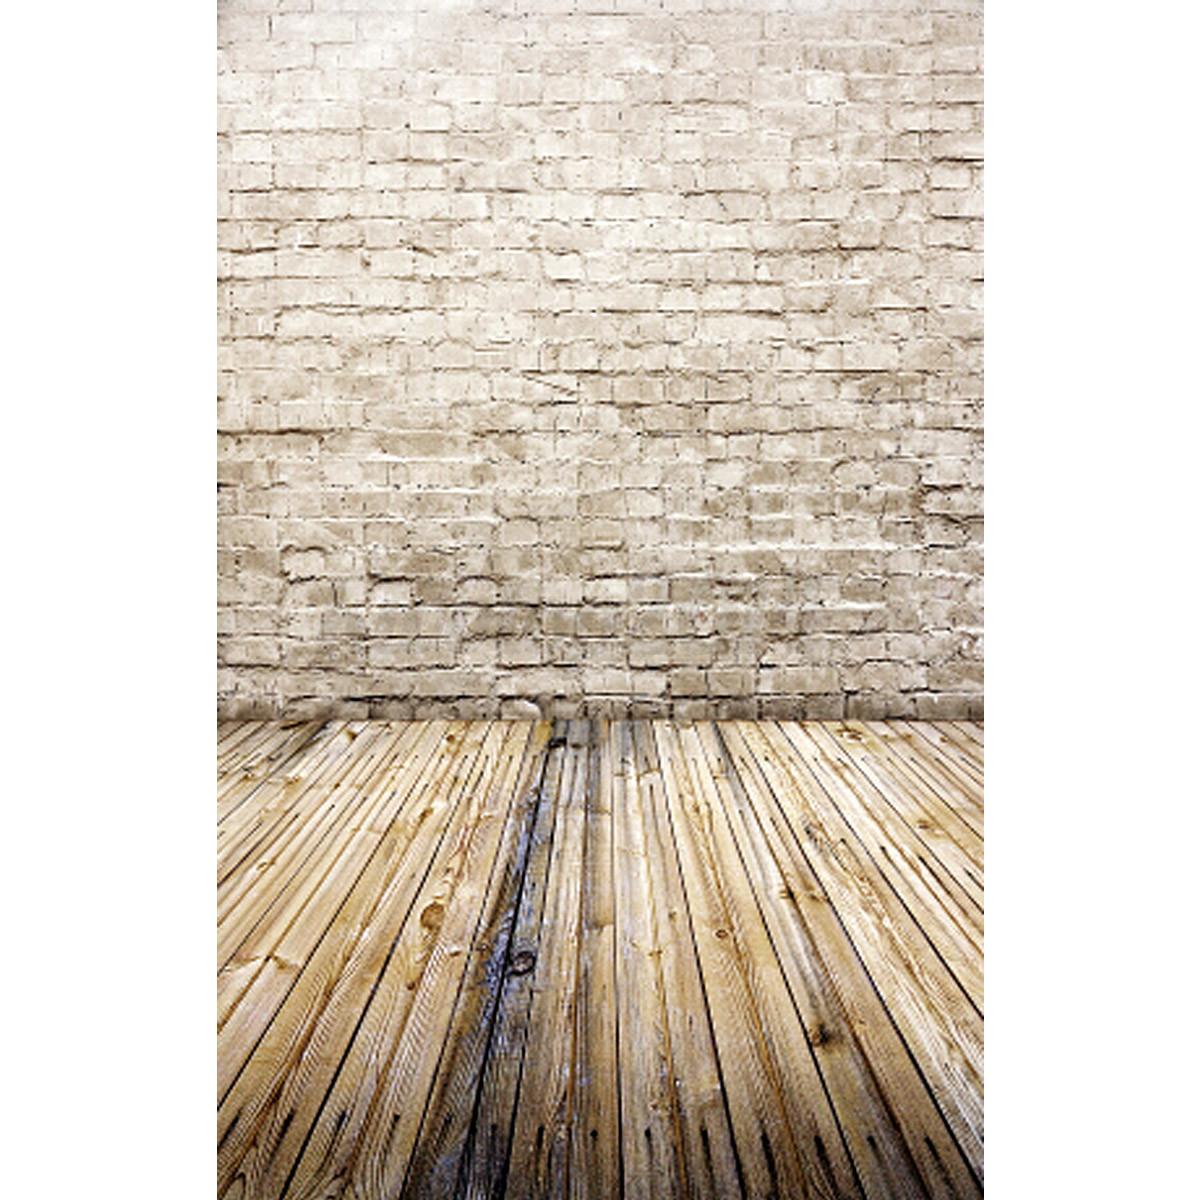 21 types vinyl wood wall floor photography studio prop backdrop background 3x5ft ebay